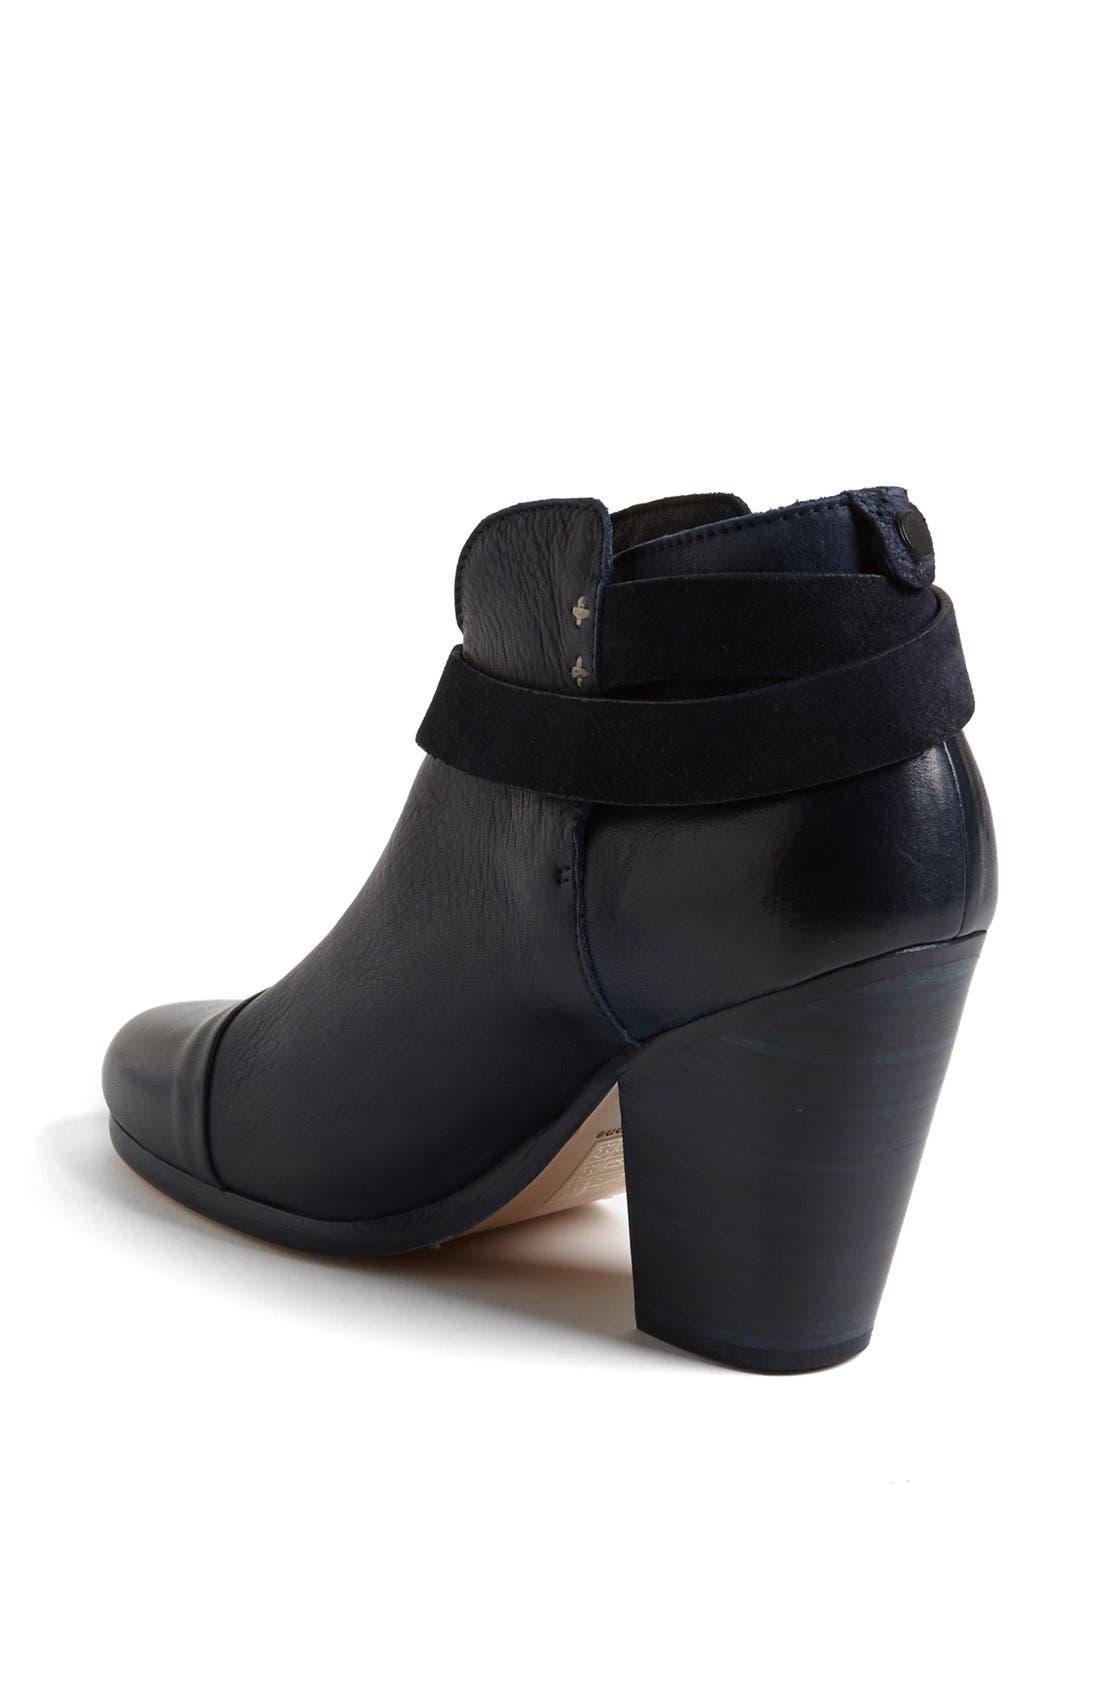 Alternate Image 2  - rag & bone 'Harrow' Ankle Boot